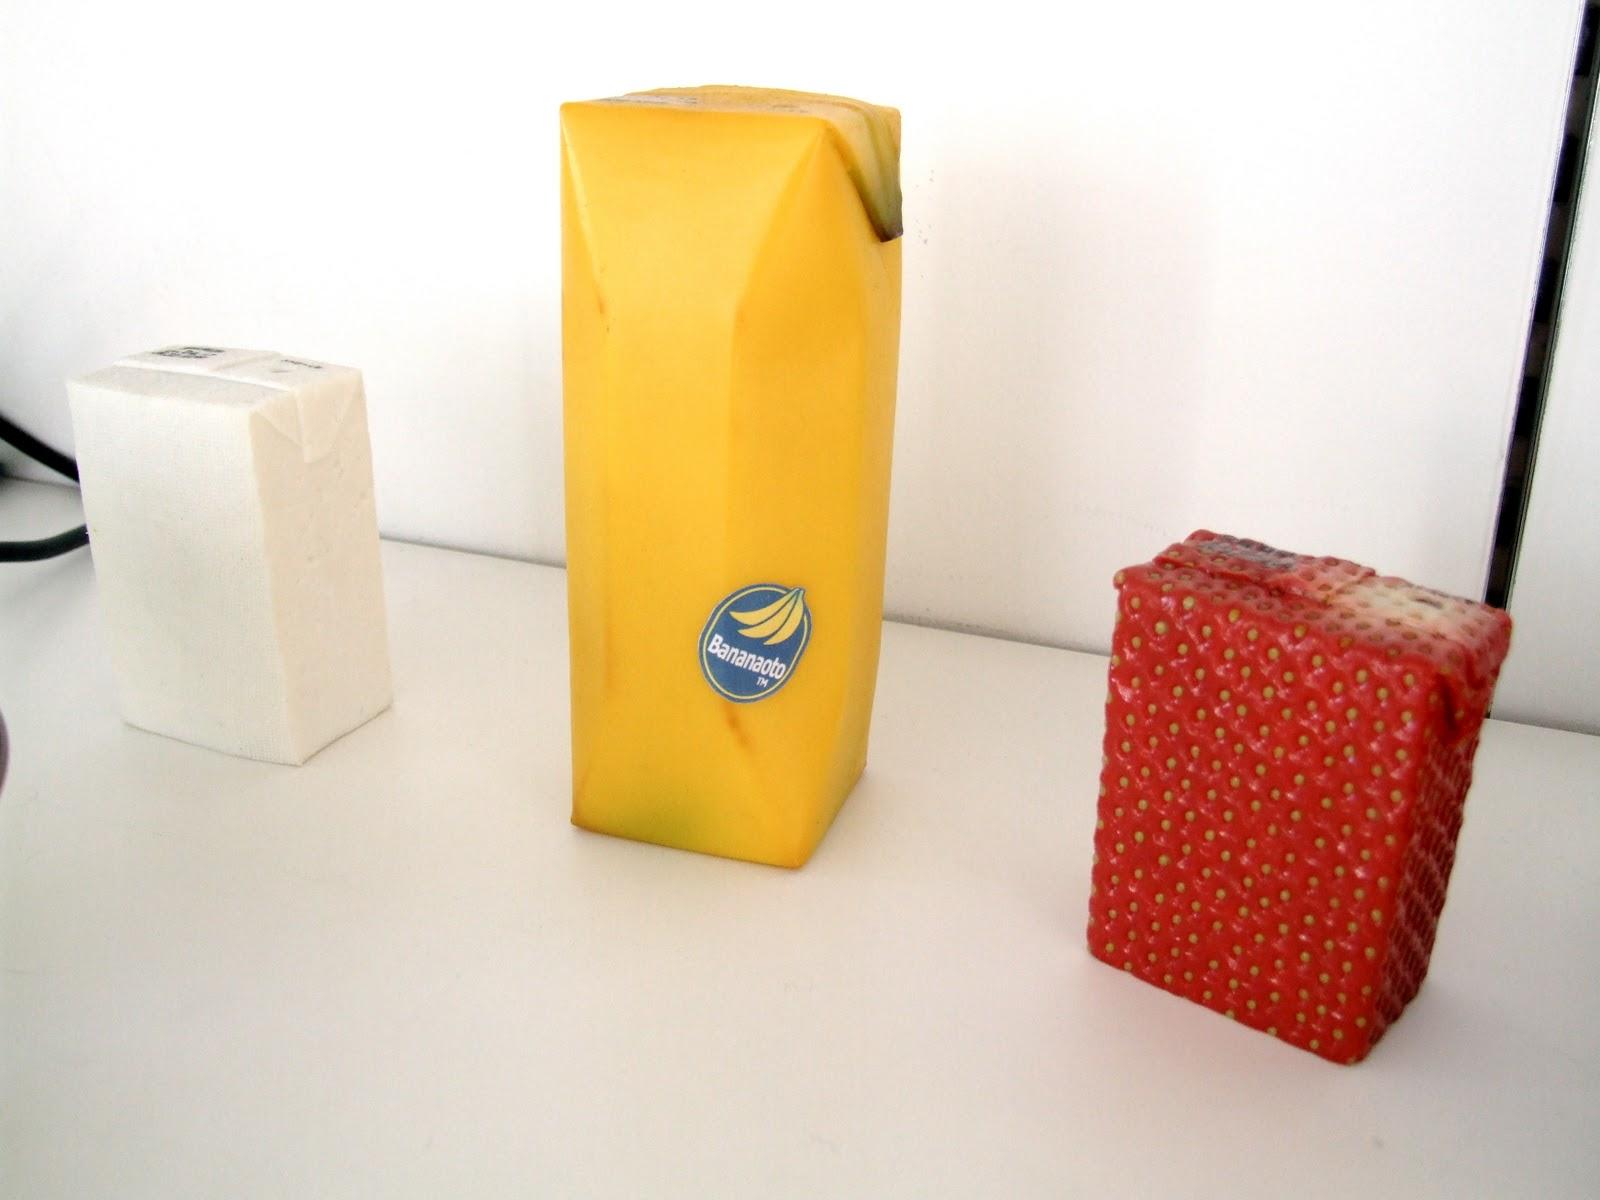 Banana_Strawberry_milk_juice_box_drink_packaging_design+%25285%2529.jpg